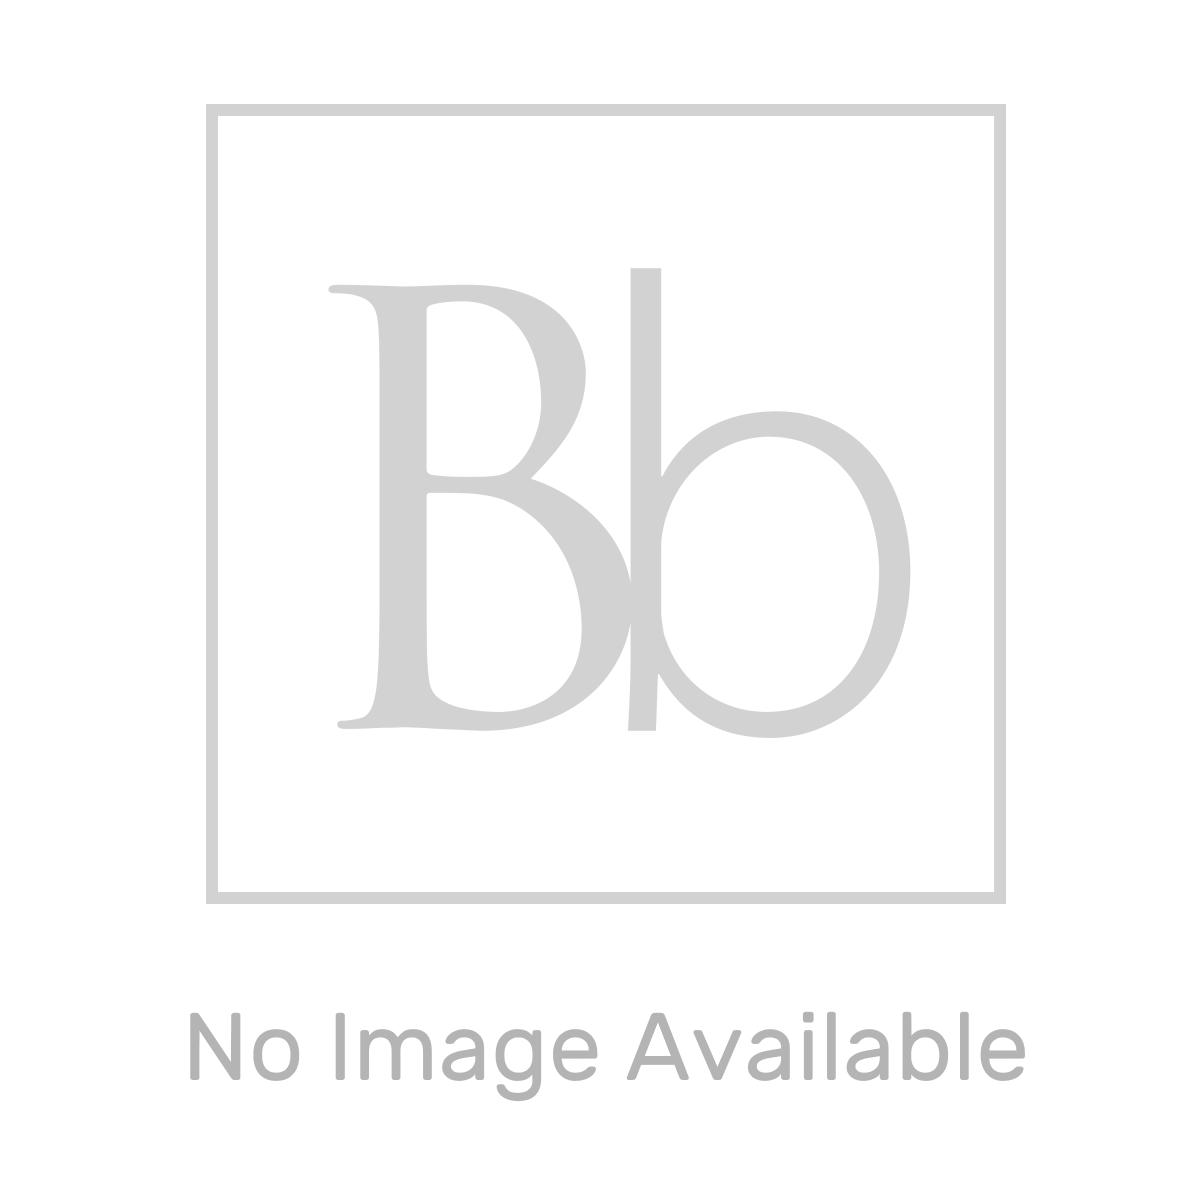 RAK Washington Greige Vanity Unit with Grey Countertop 800mm Measurements